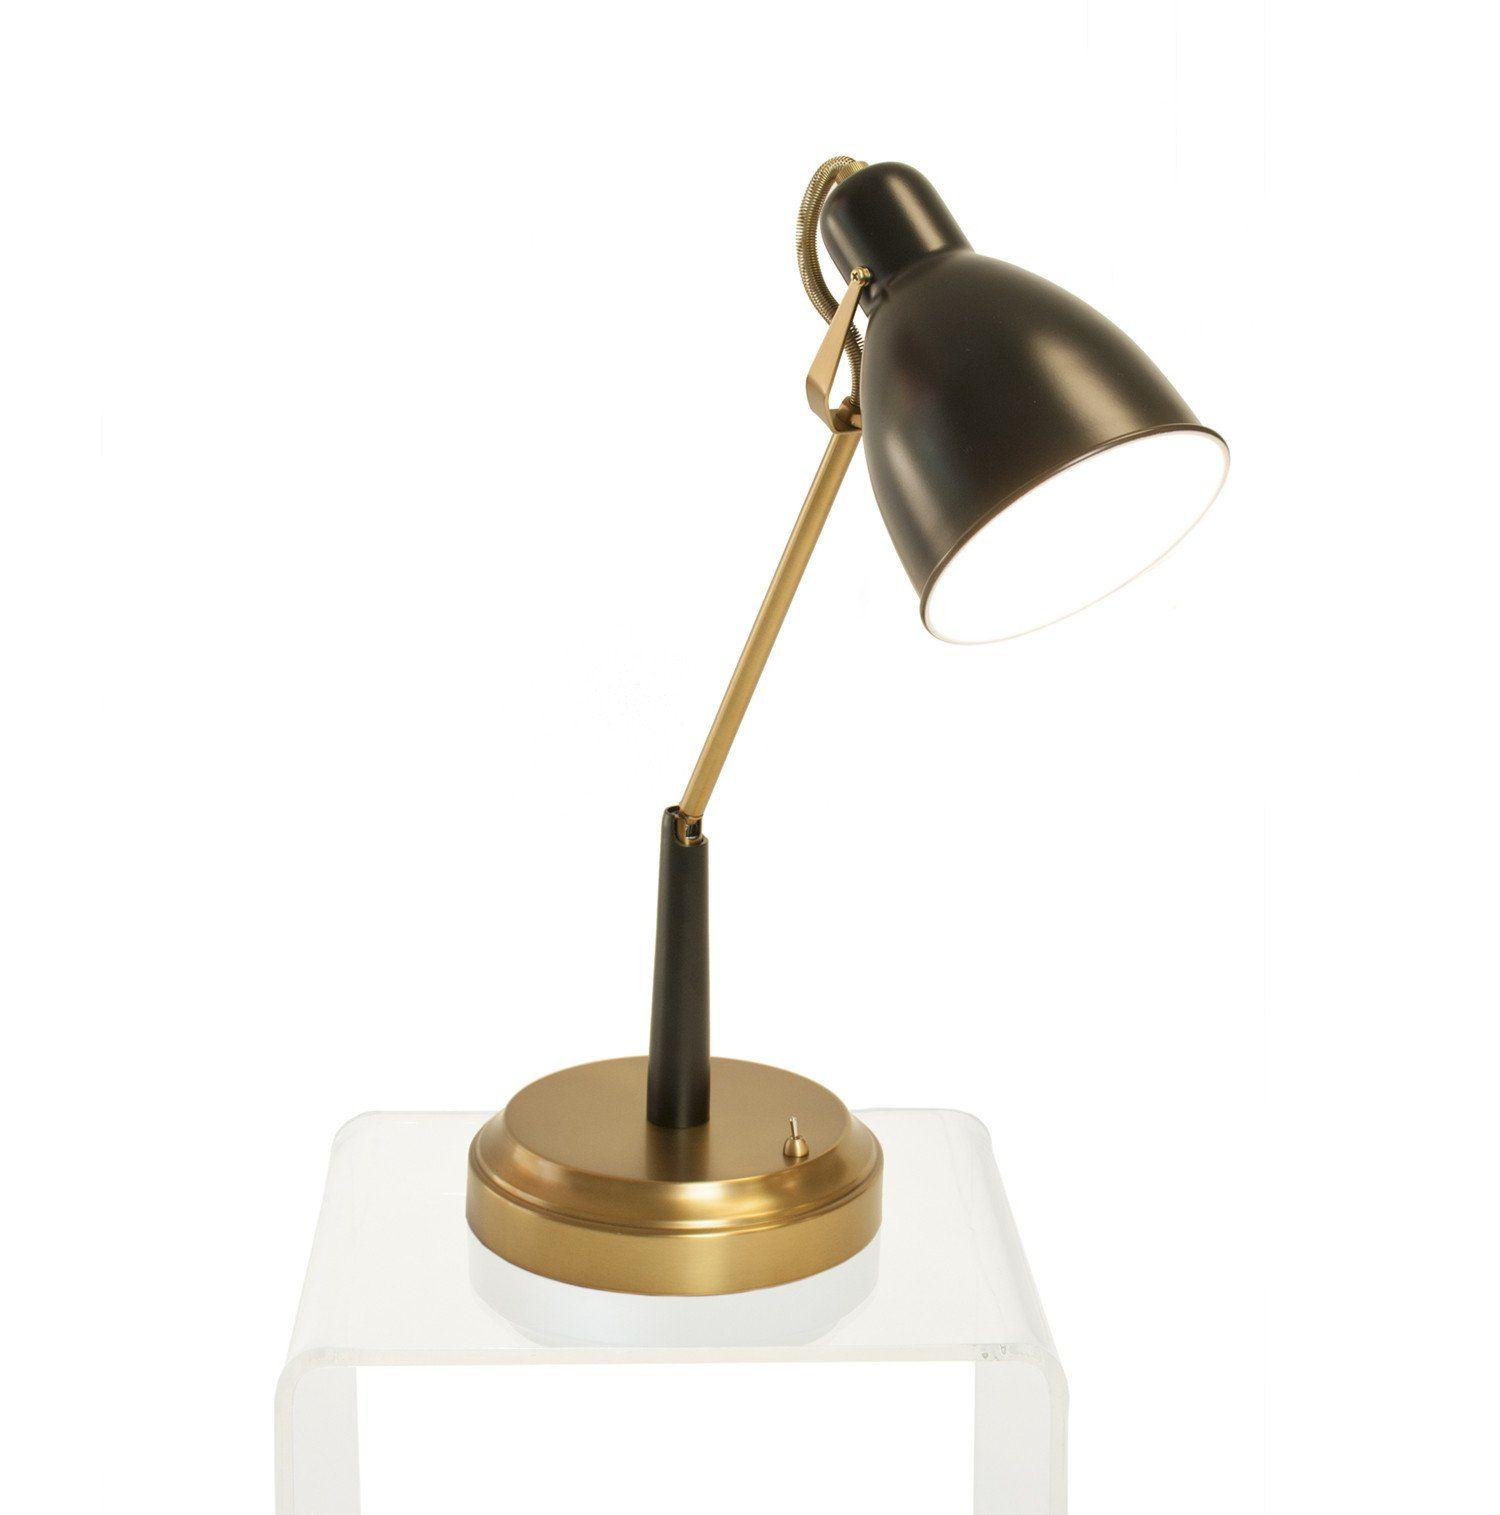 Oscar Cordless Task Lamp Black And Antique Brass Desk Lamp